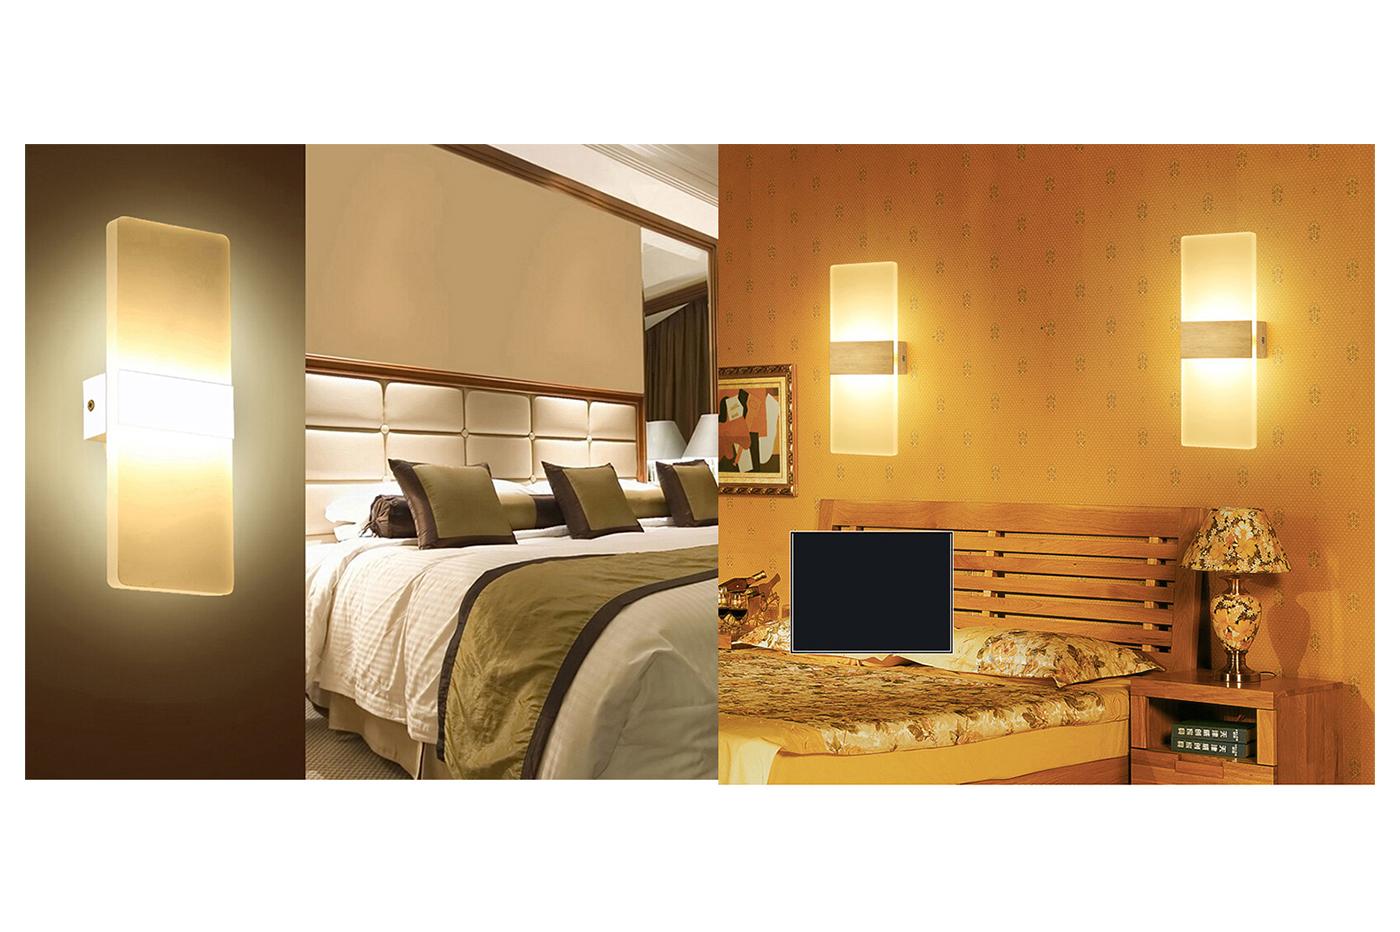 Bes 25075 applique beselettronica lampada da parete applique